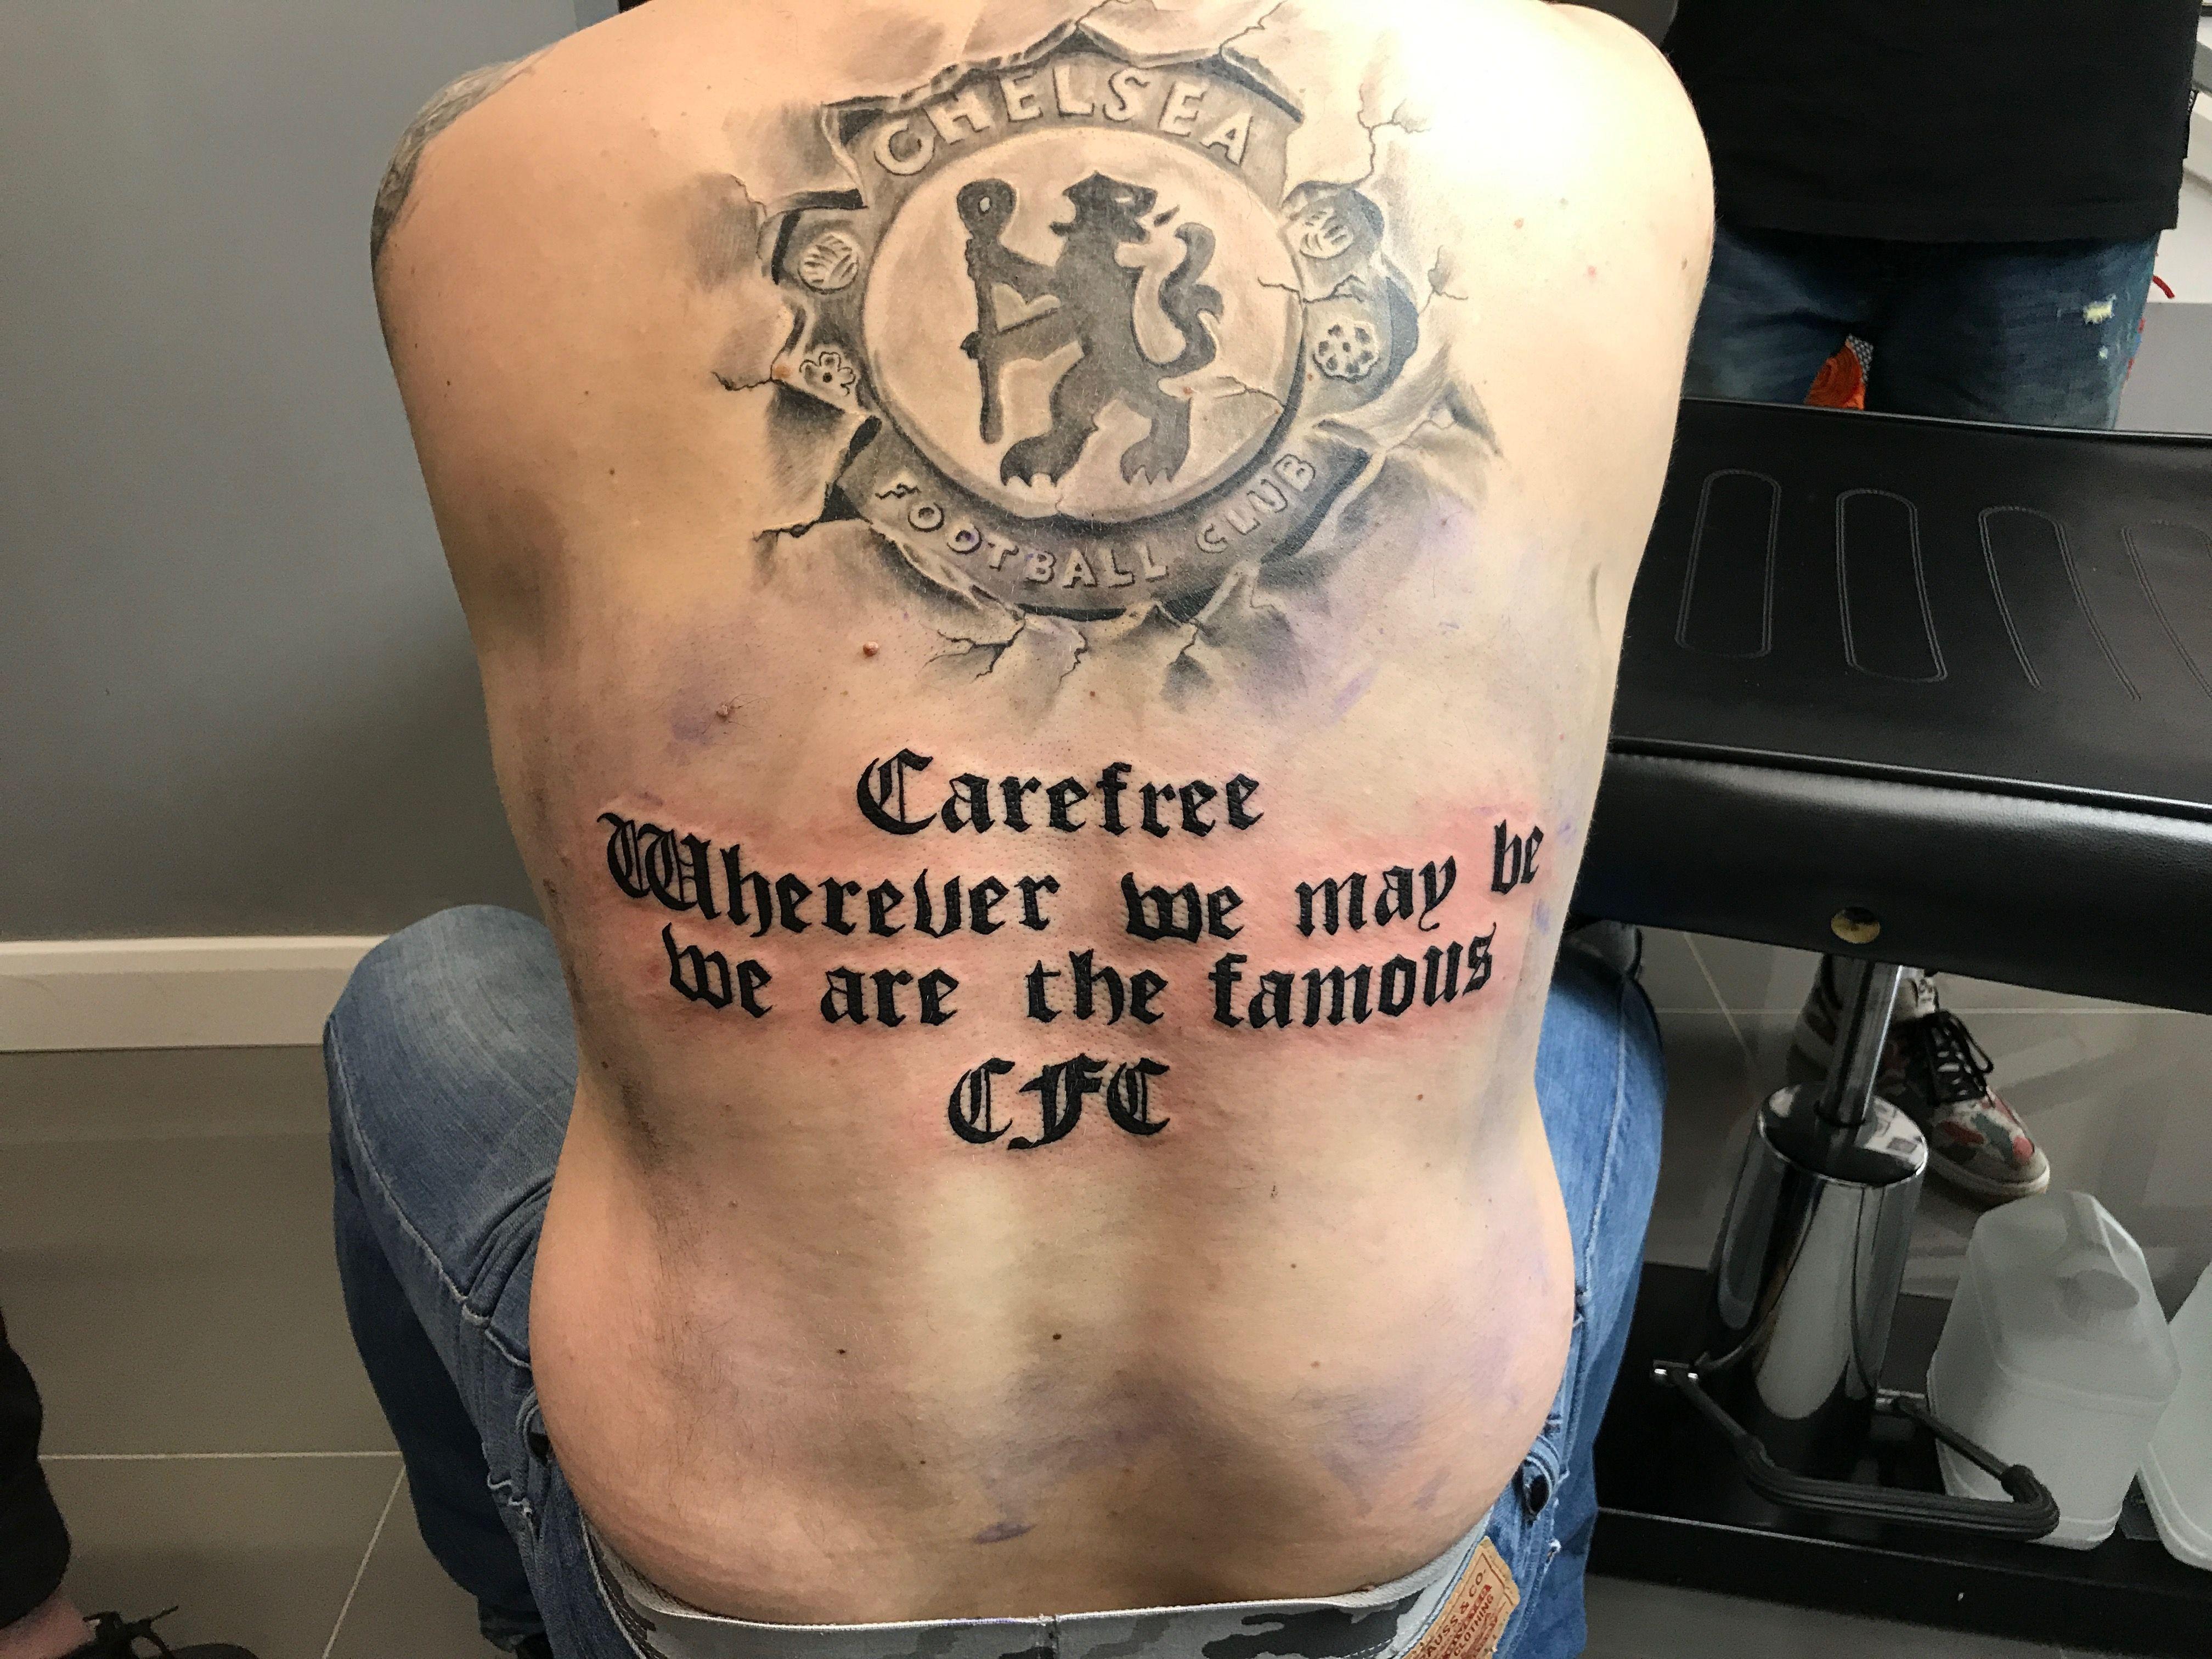 Chelsea FC tattoo quotes